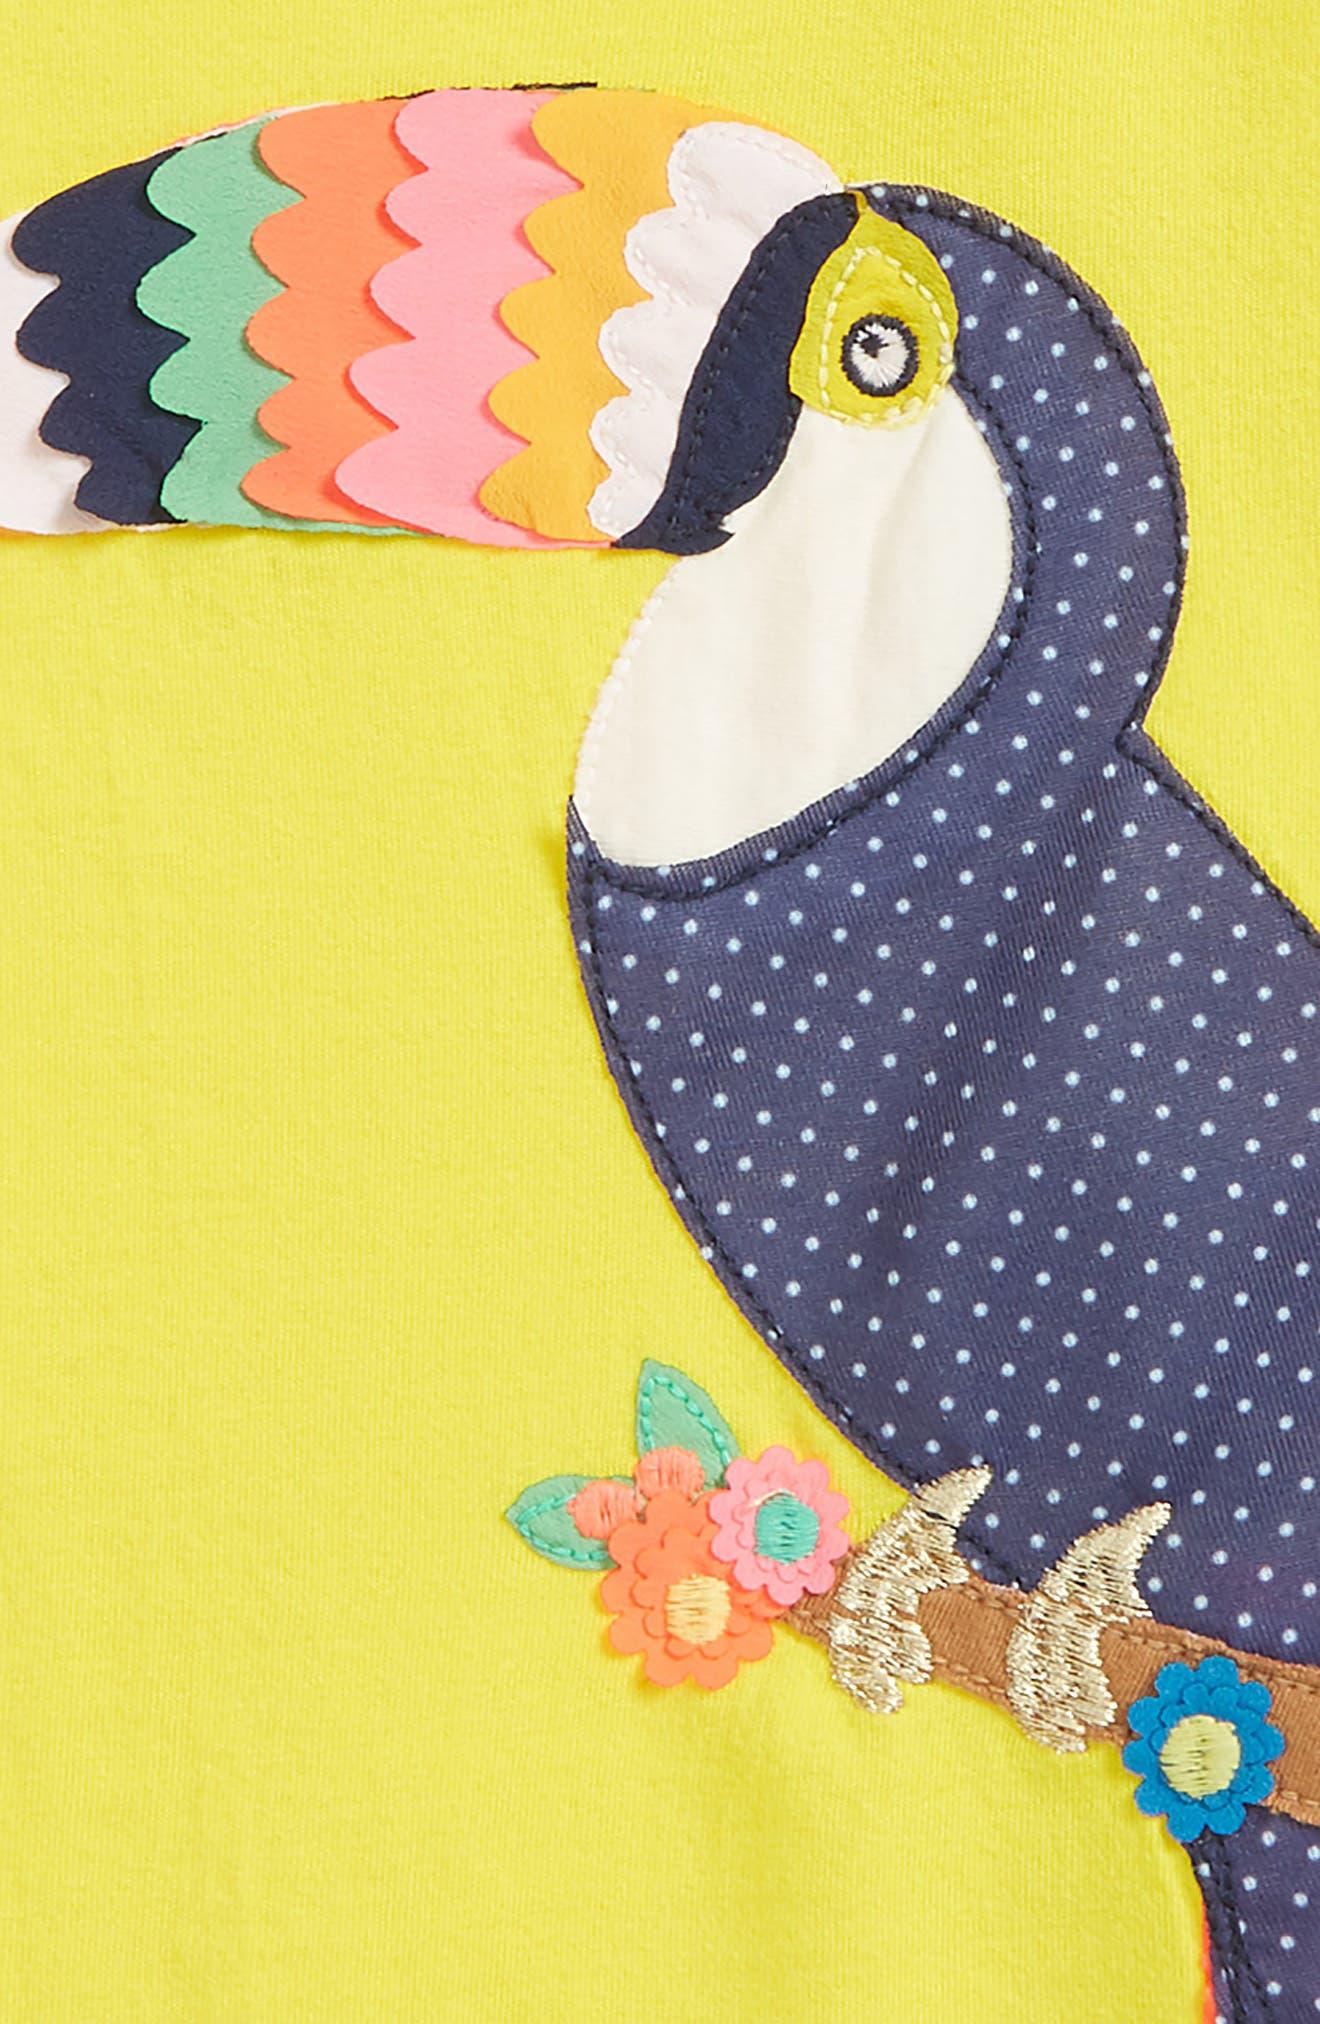 Fluttery Animal Tee,                             Alternate thumbnail 2, color,                             Sunshine Yellow Touc